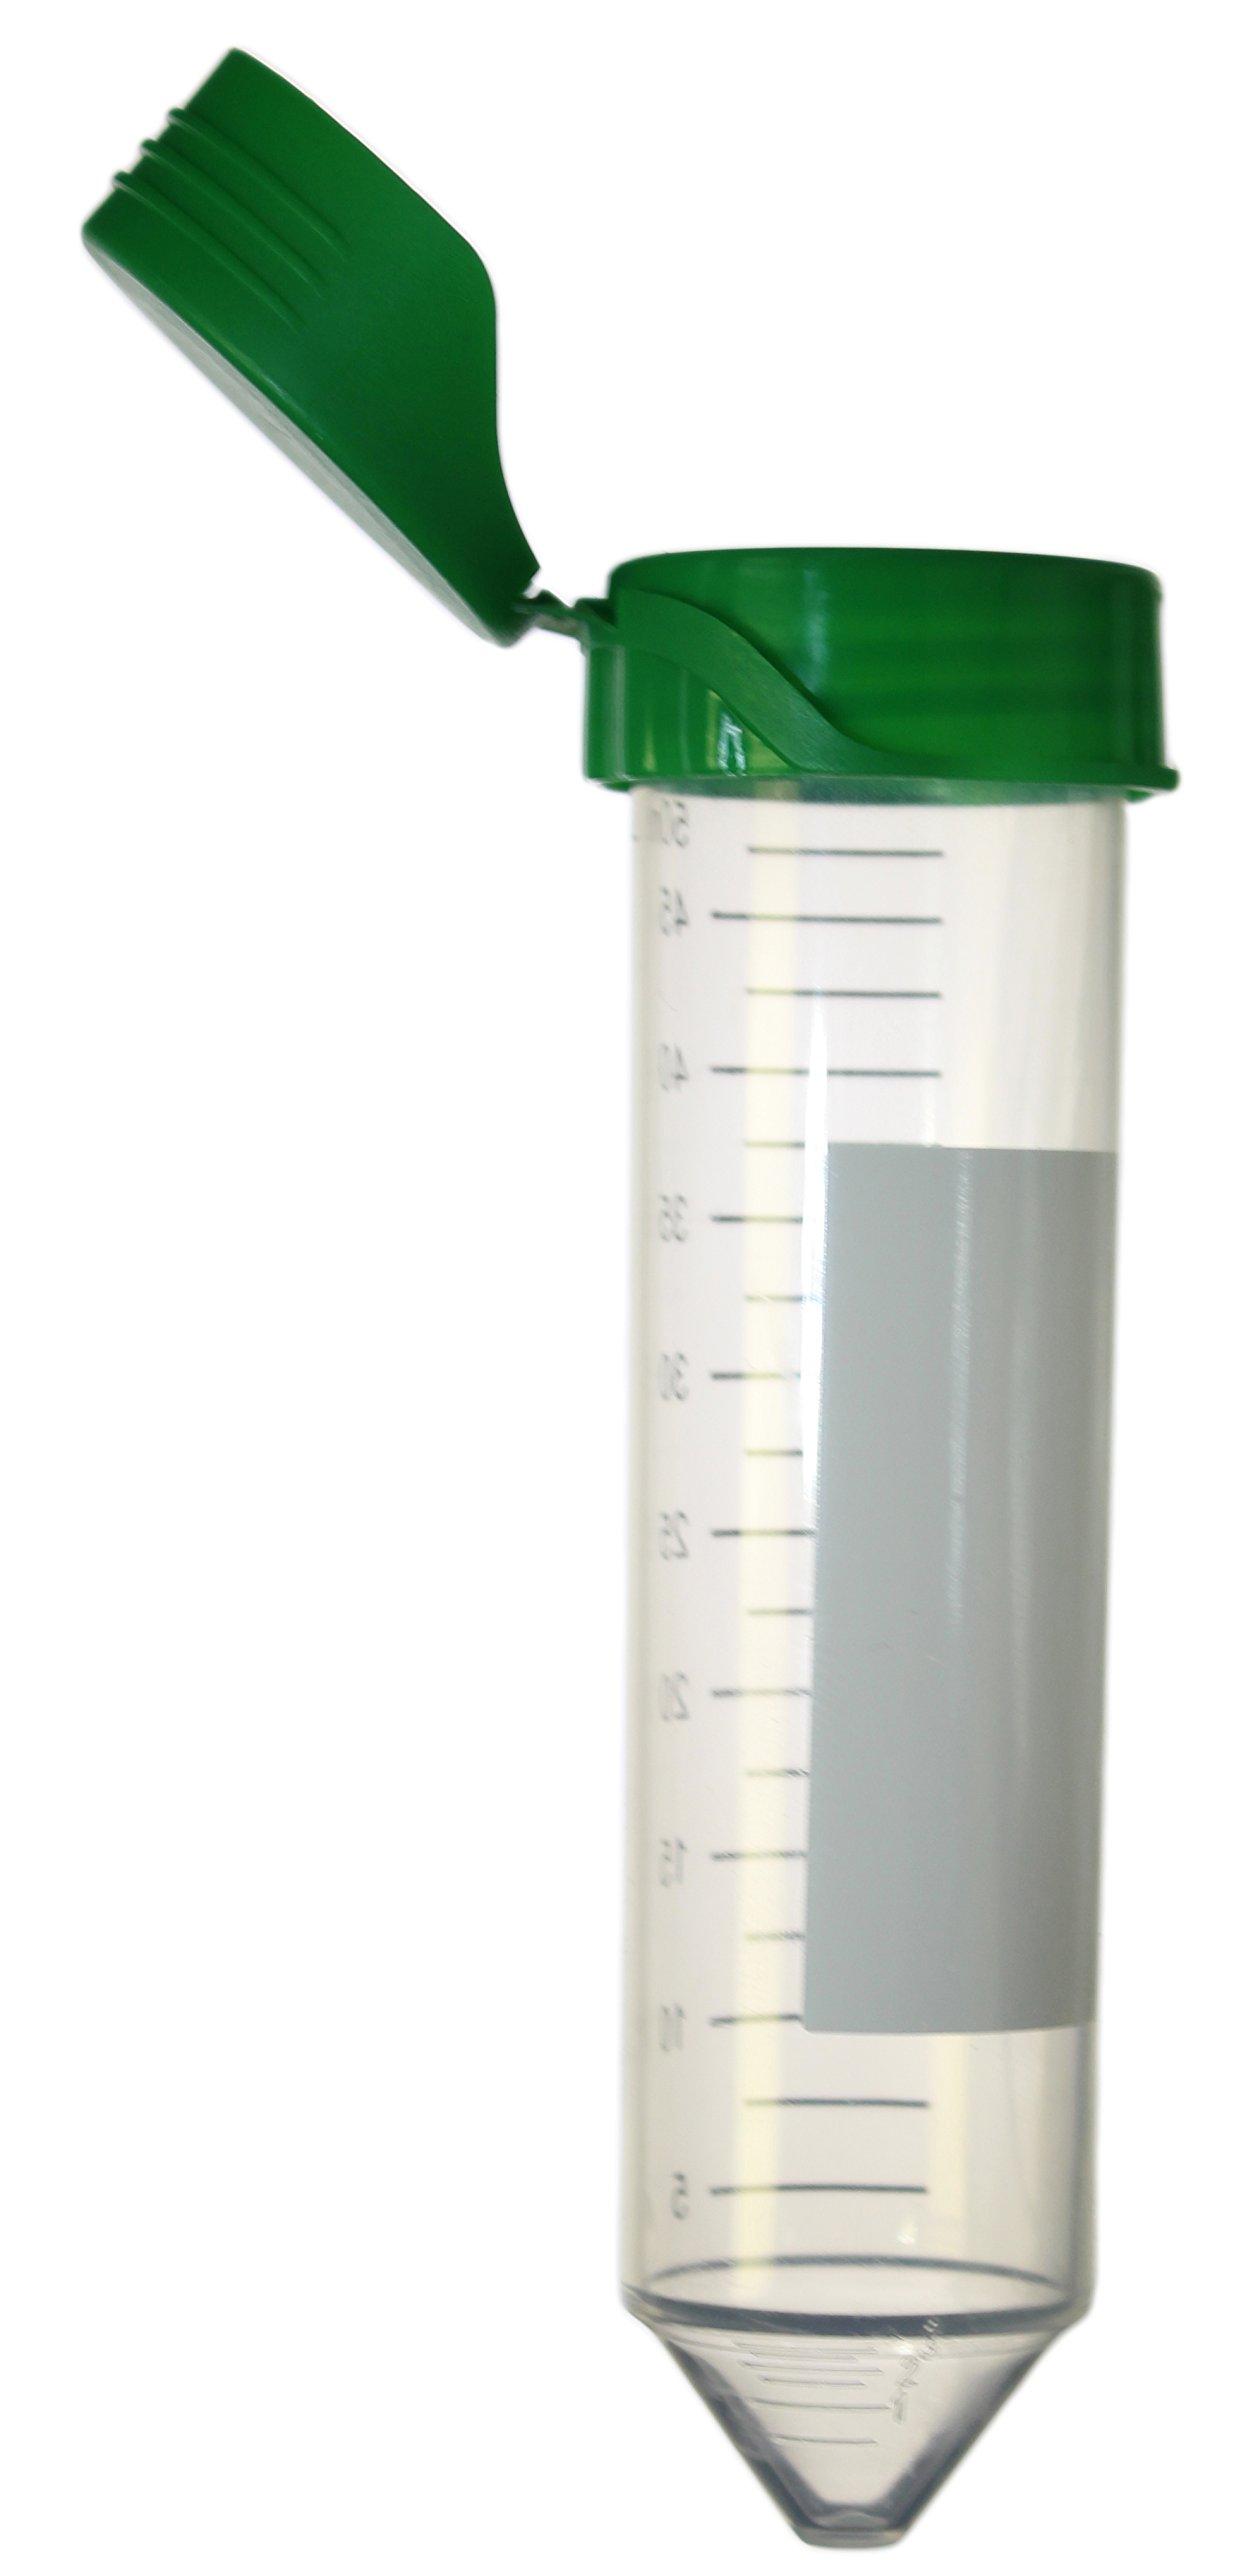 50 mL Centrifuge Tubes with Flip Caps & Paper Rack, Conical, Sterile, Dnase/Rnase Free, Rack of 25